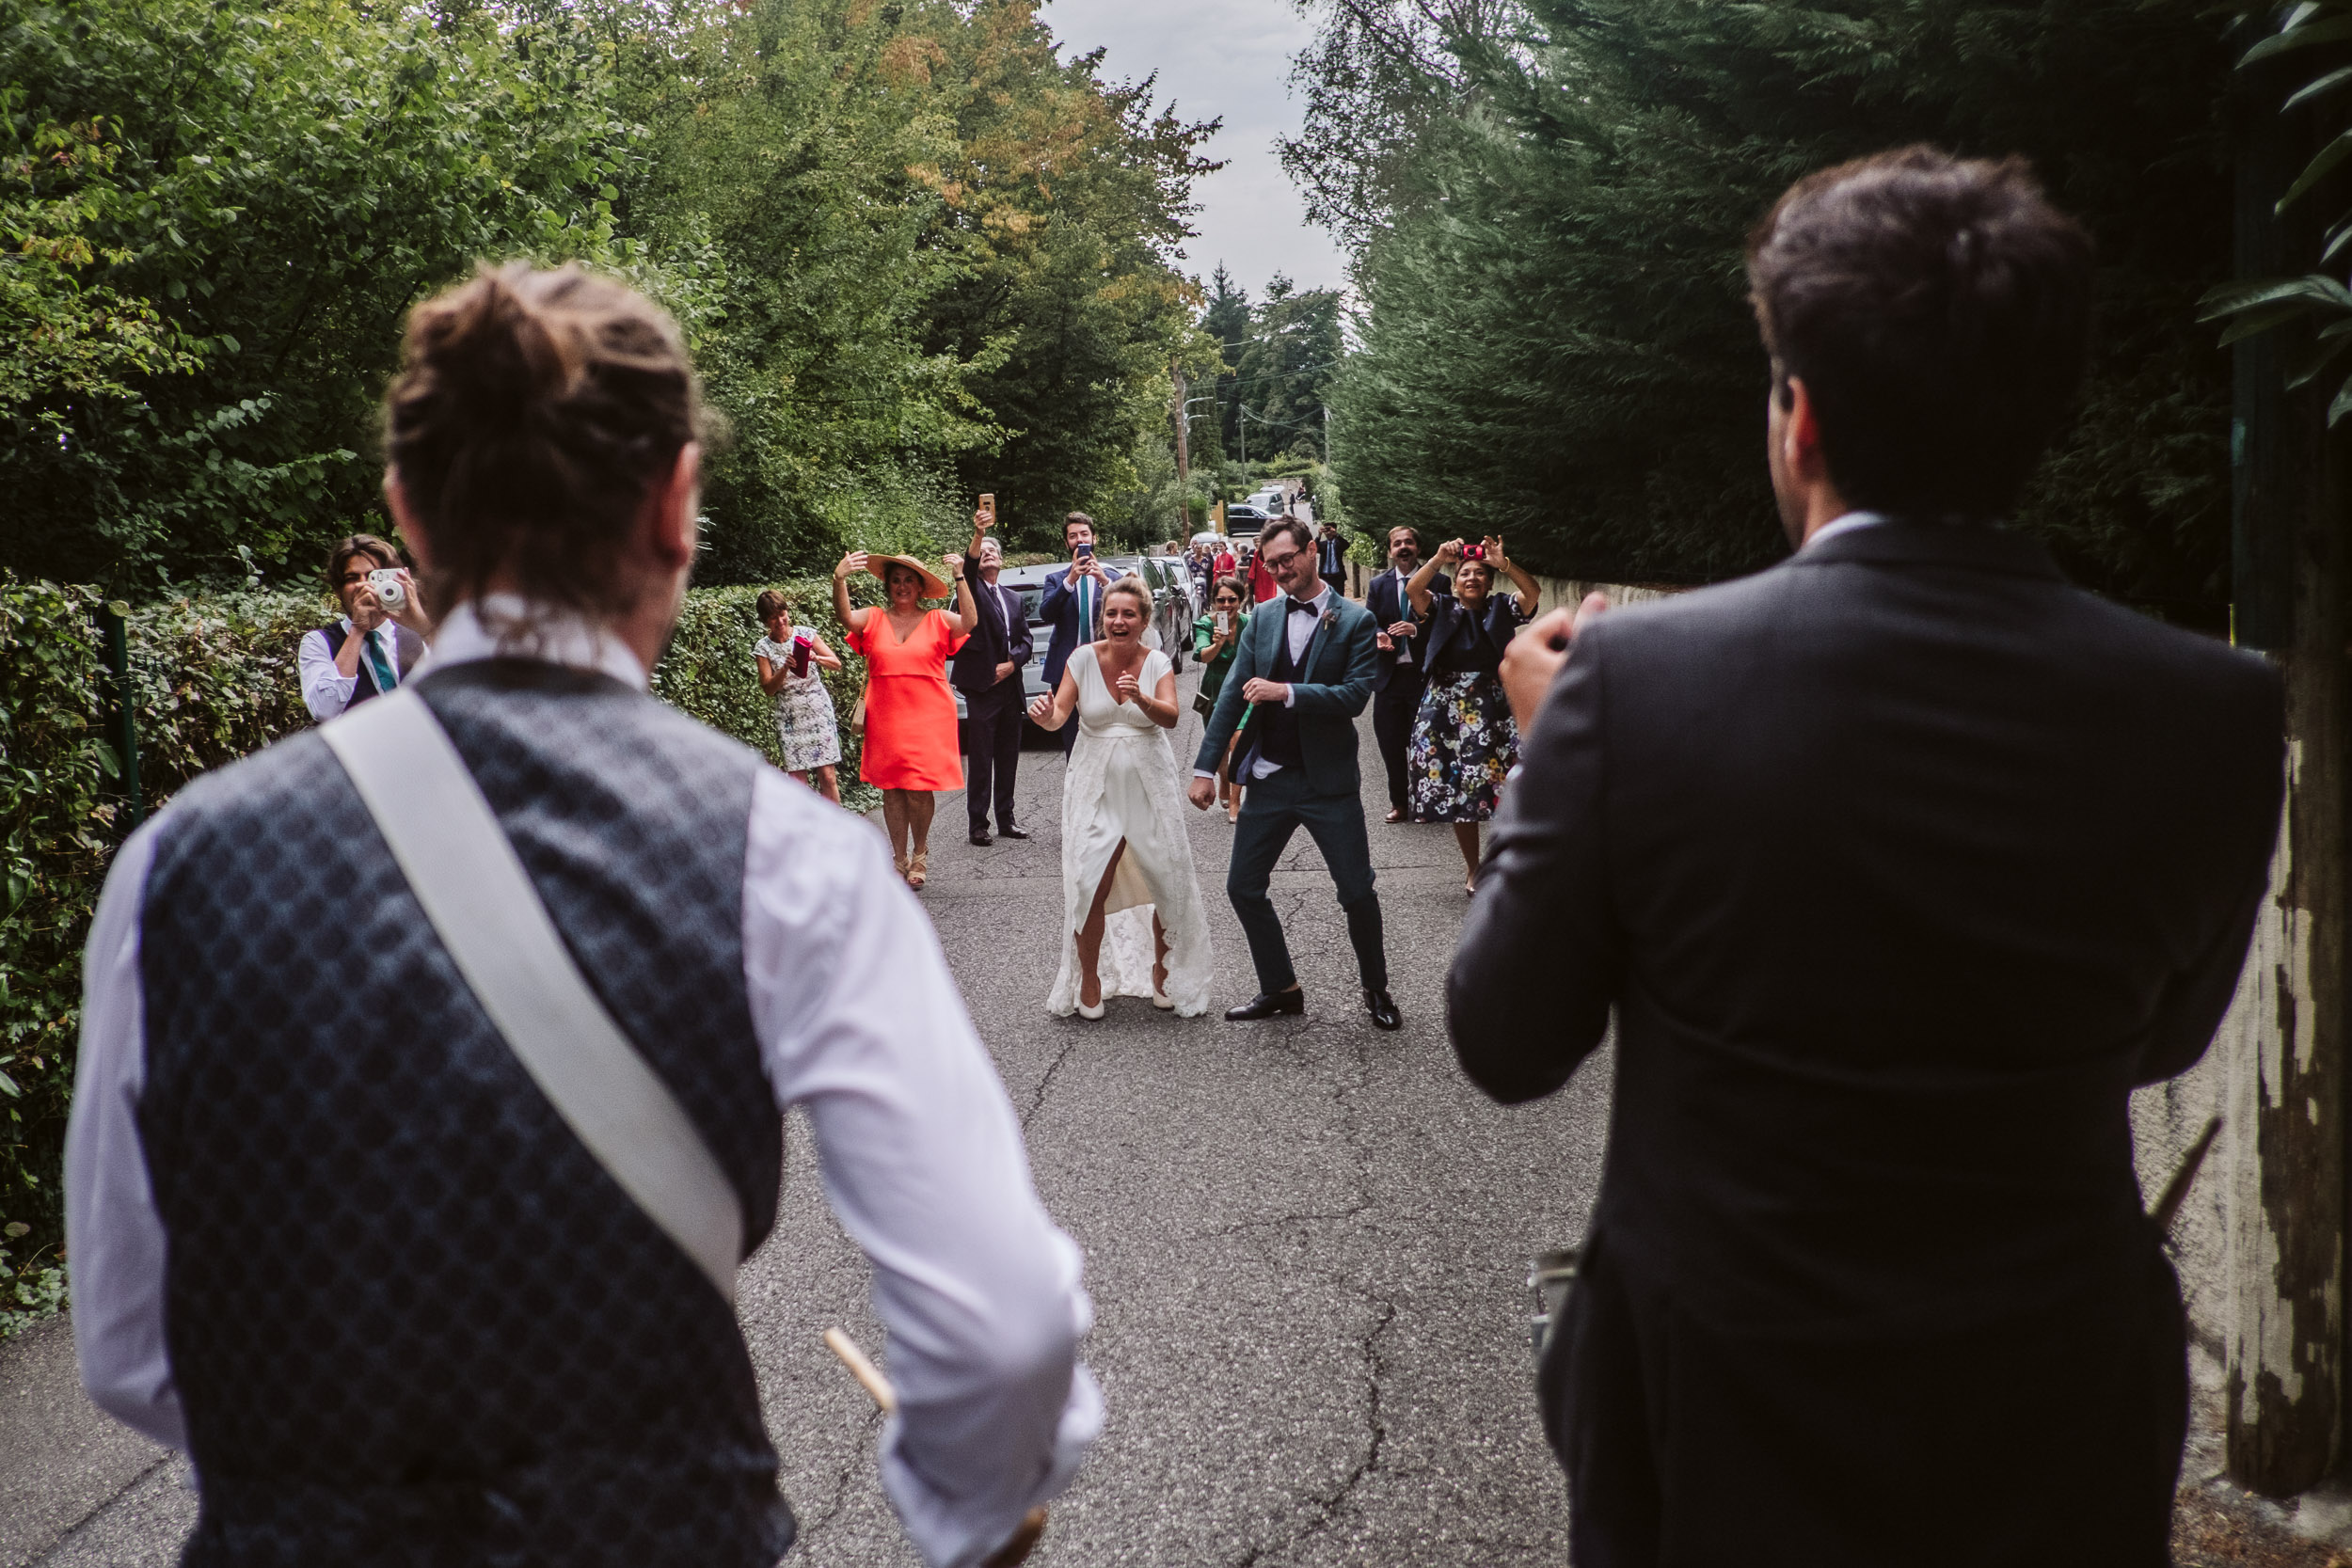 gerald-mattel-photographe-mariage-annecy-verrier-menthon-9.jpg